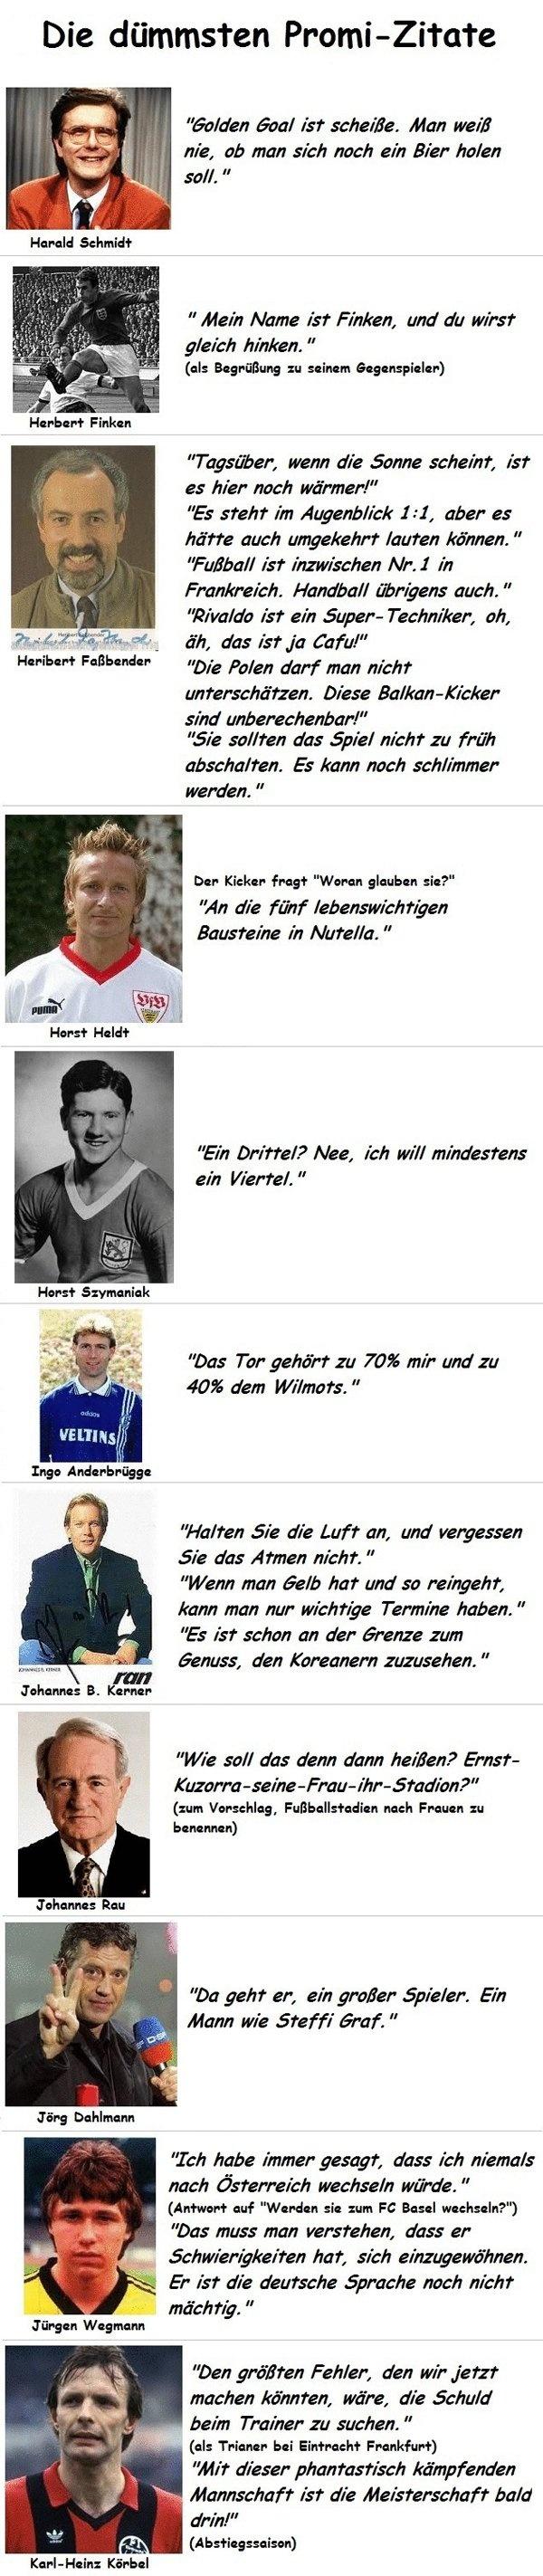 Die dümmsten Promi-Zitate (Fußball Teil 2) - Fail Bild | Webfail - Fail Bilder und Fail Videos